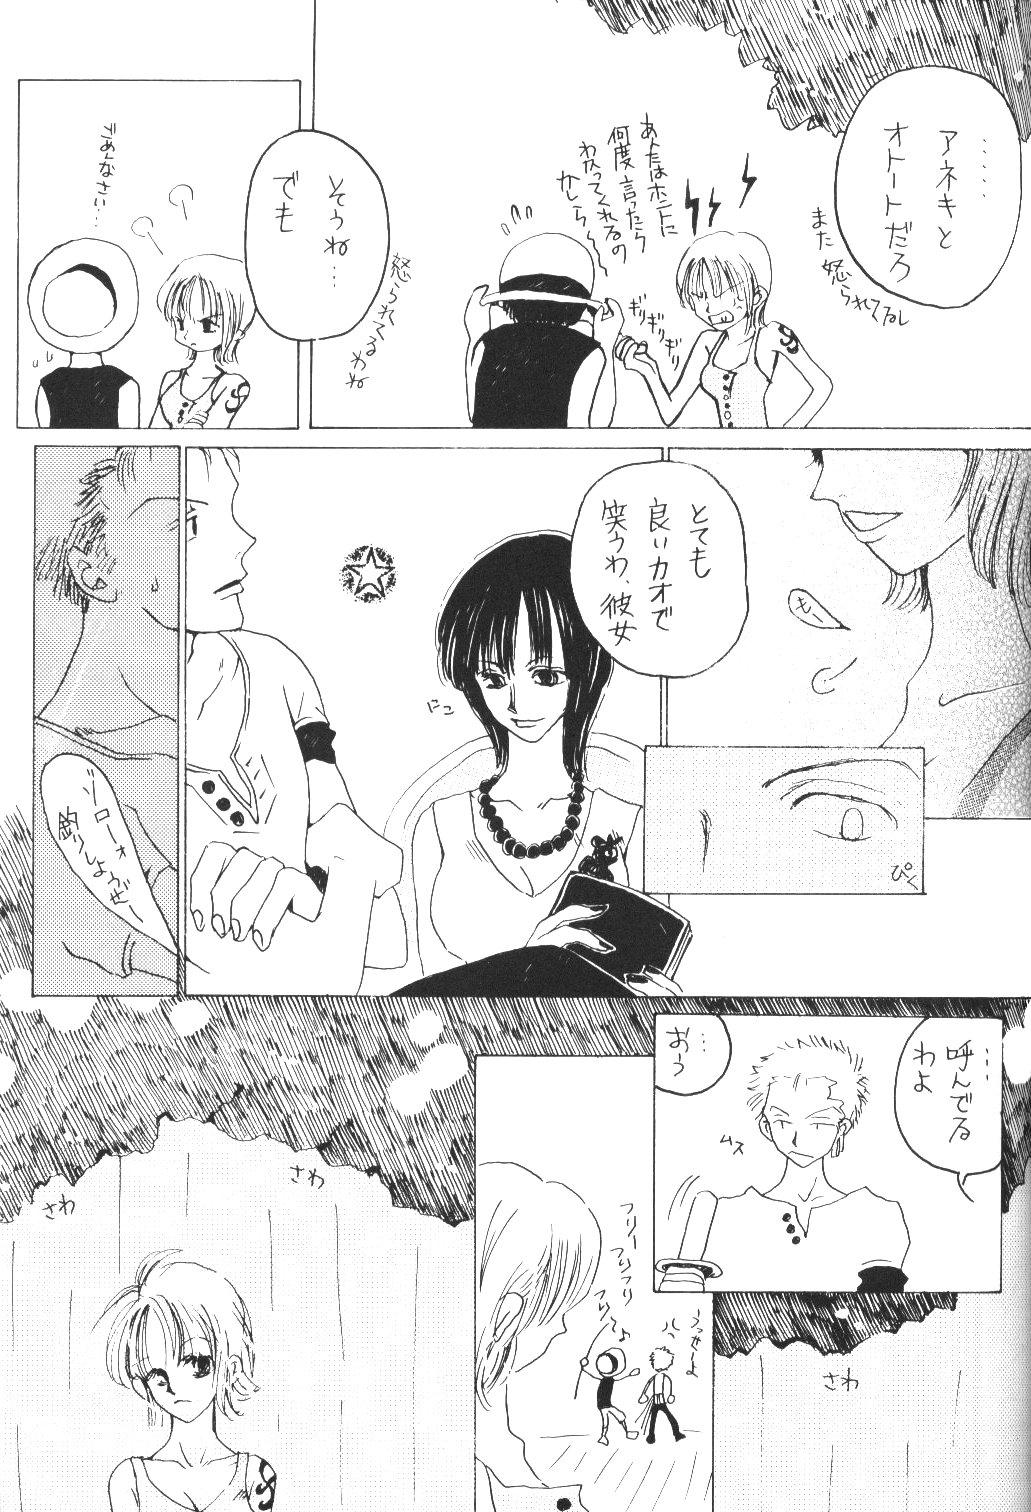 Yume Ichiya 2 59